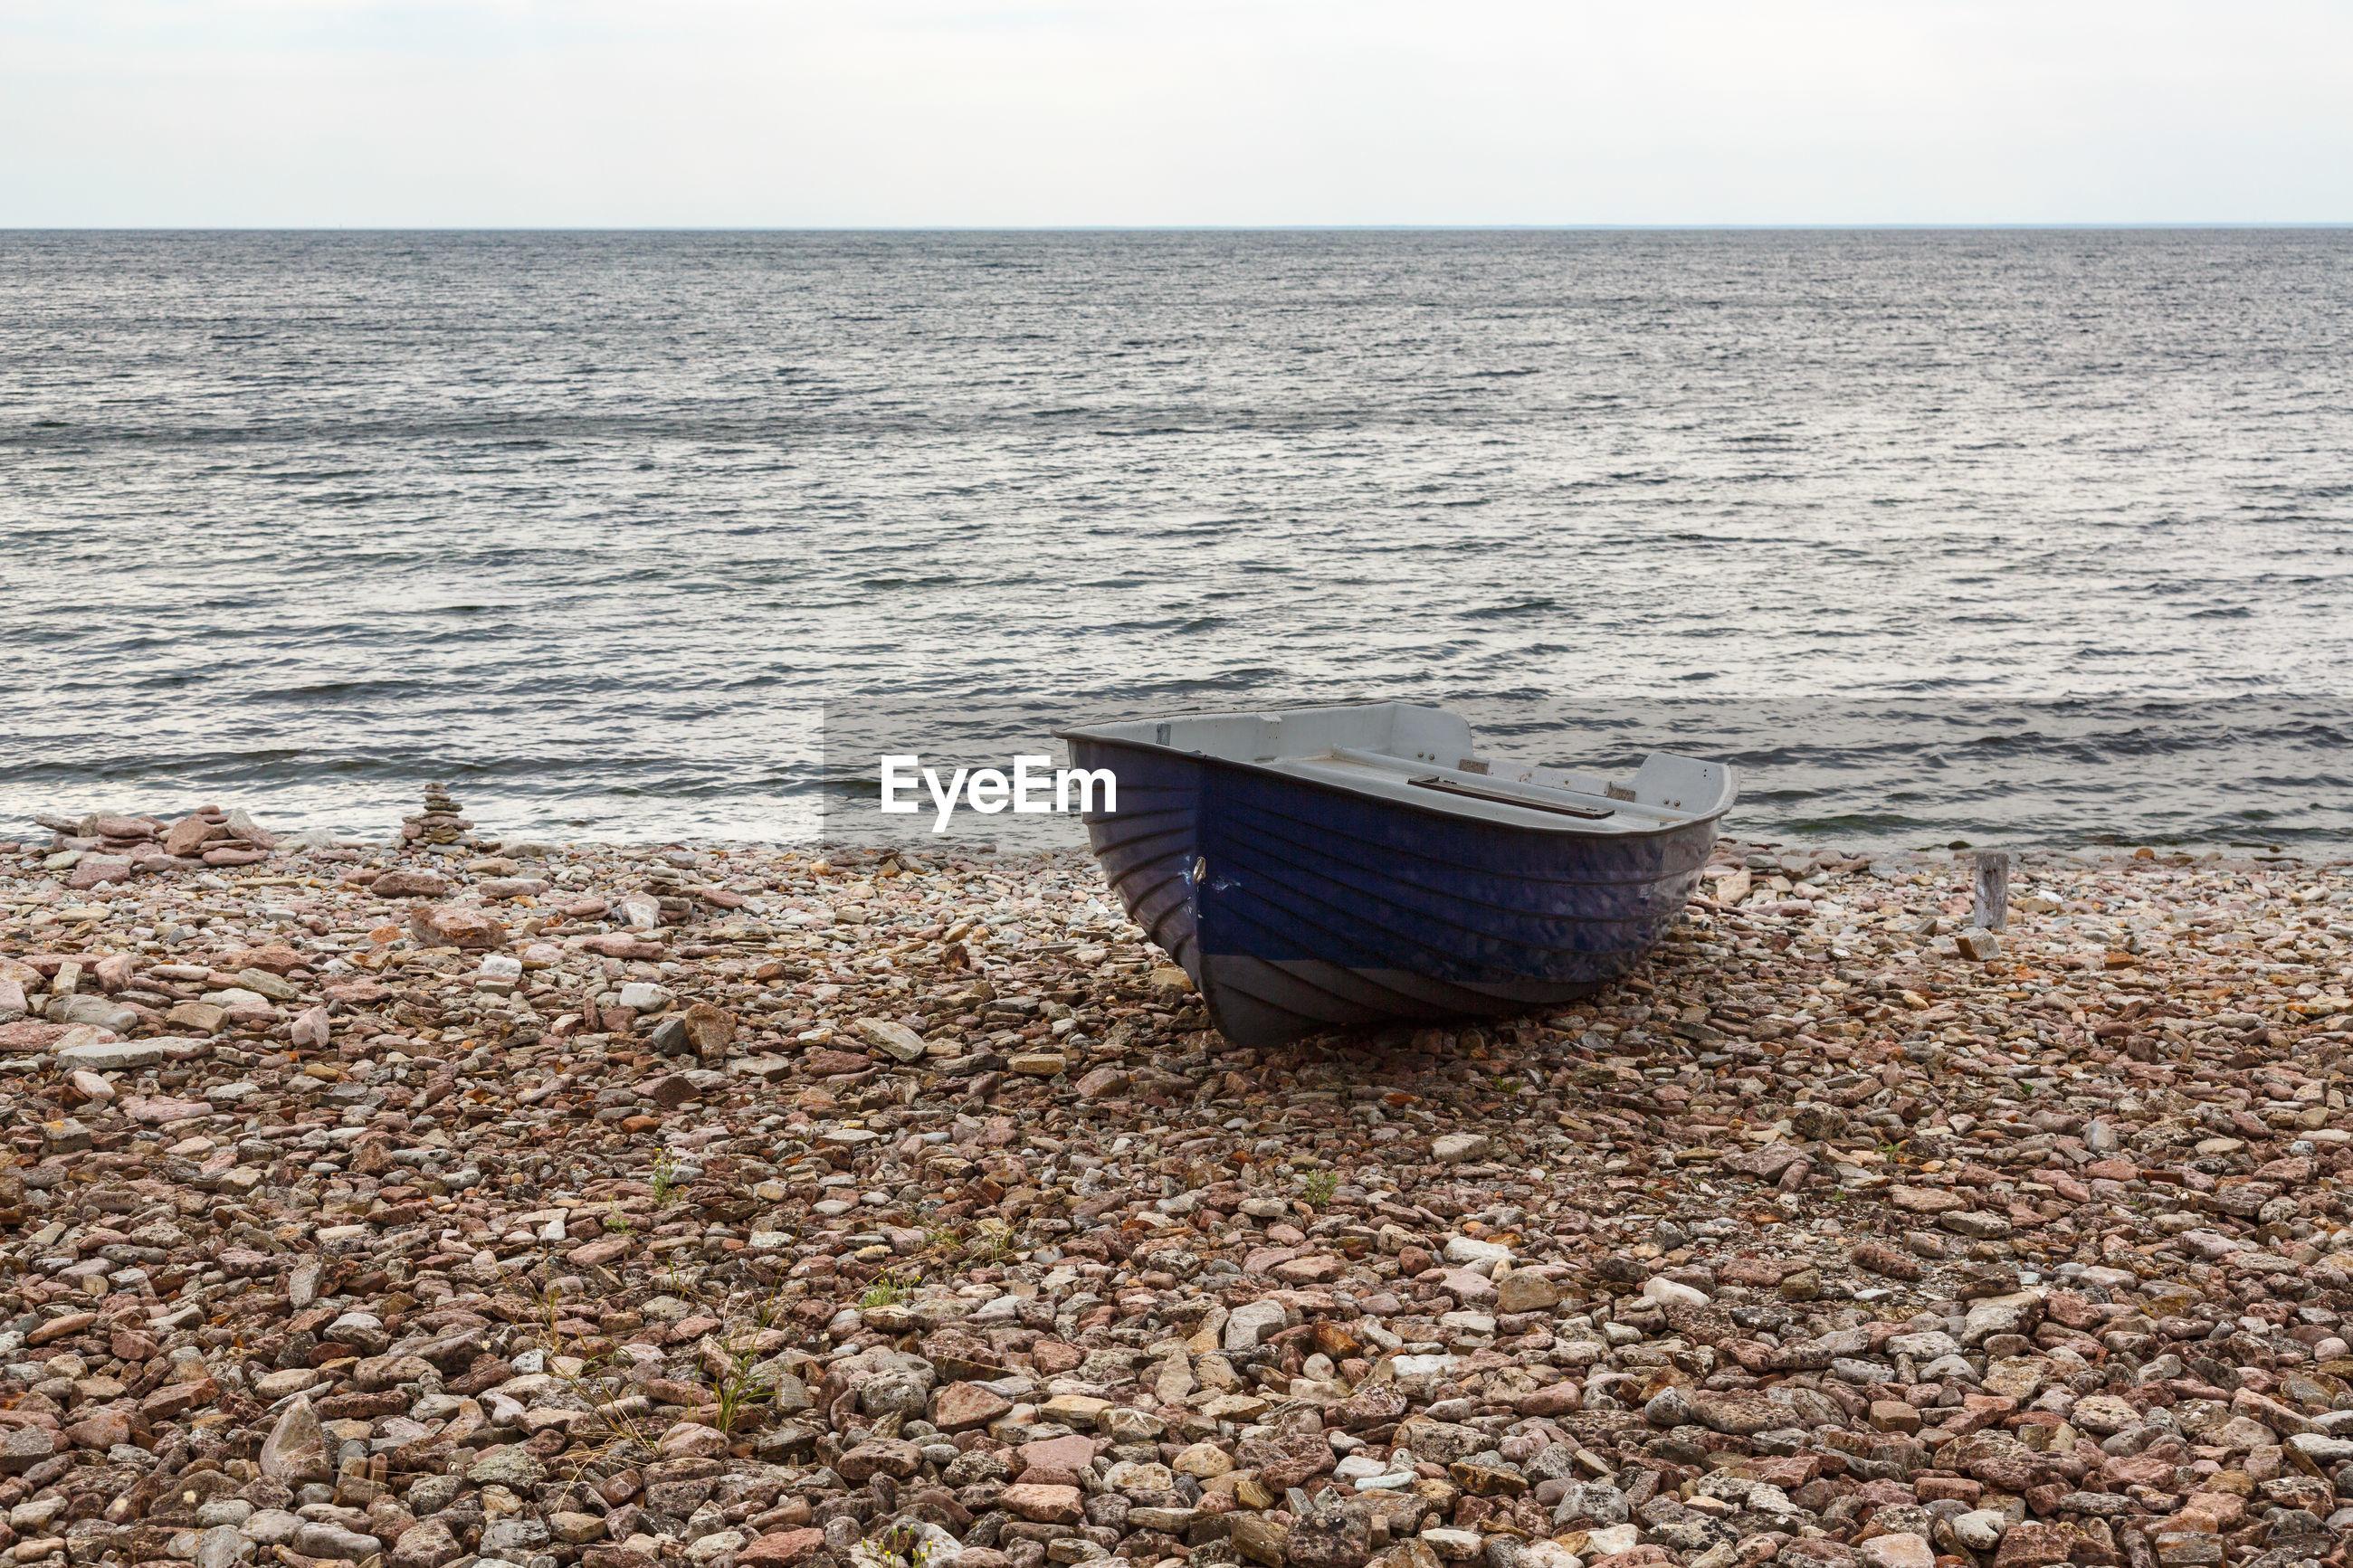 DECK CHAIR ON SHORE AGAINST SEA